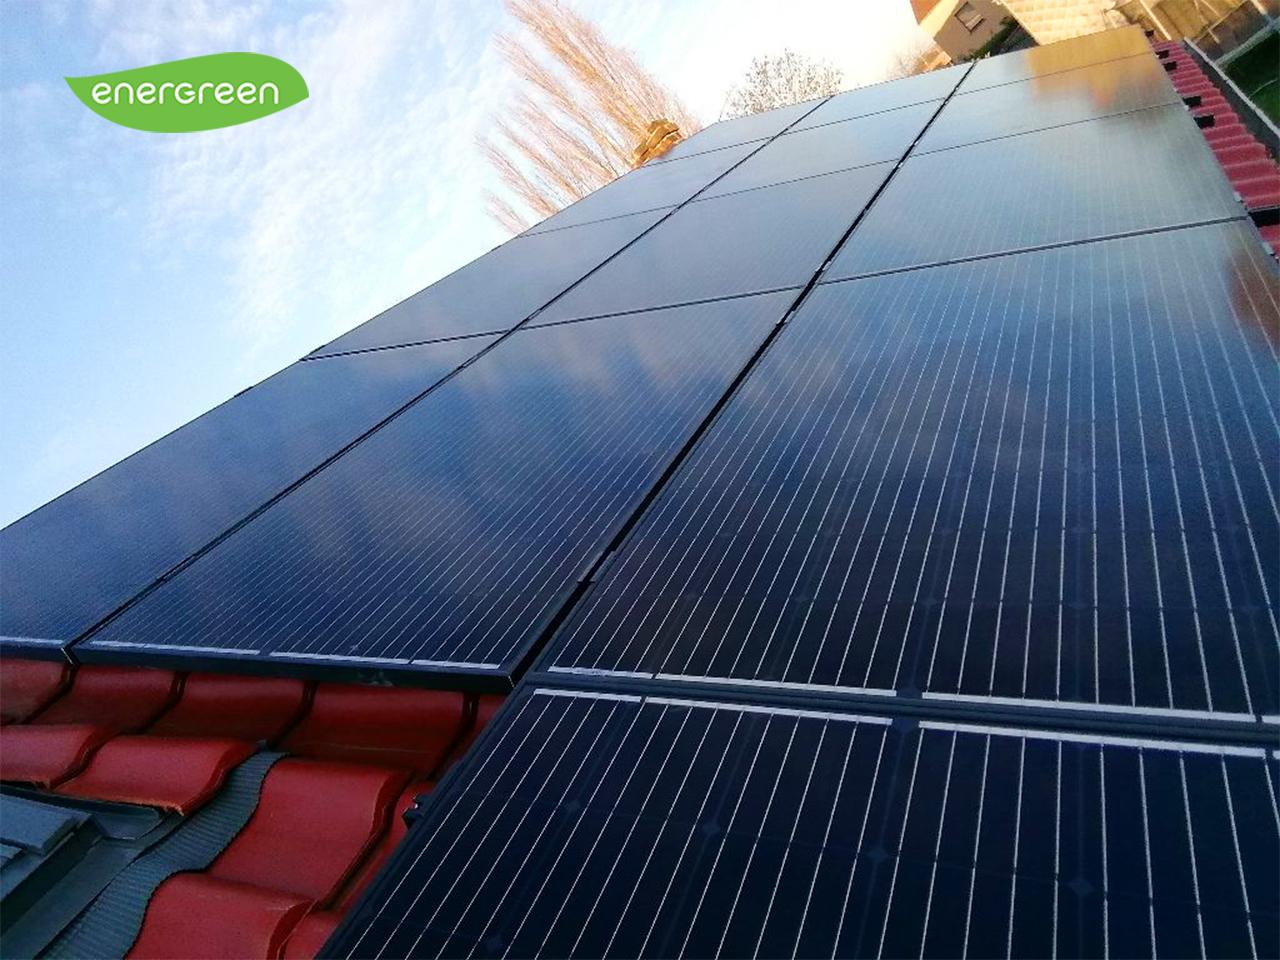 Installation panneaux photovoltaïques Seraphim 310W Label Black Energreen